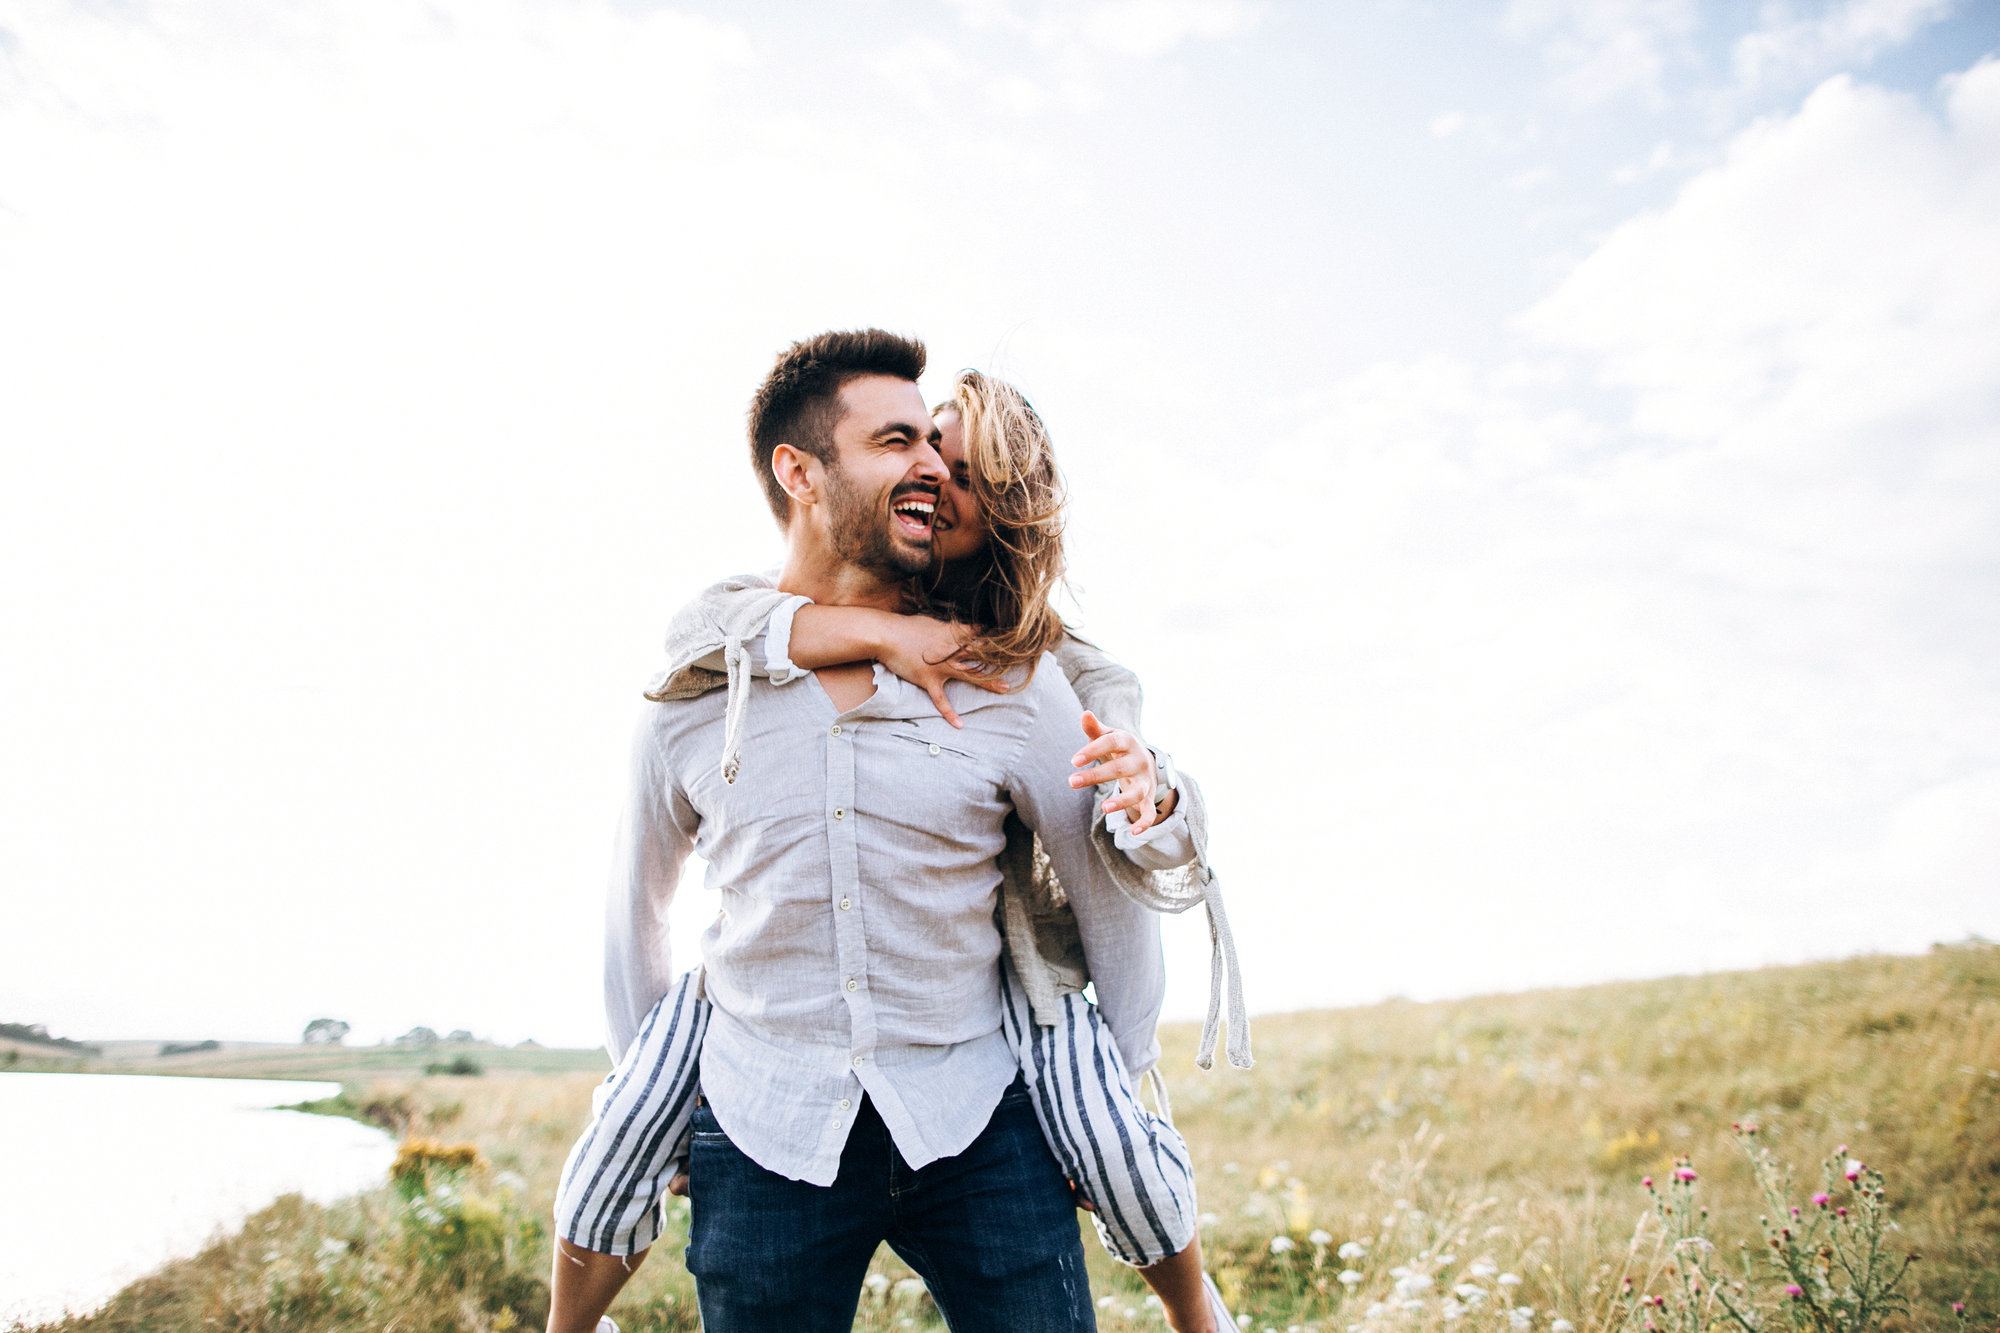 Oleksandr Bondar Couple Photoshoot Valentine's Day